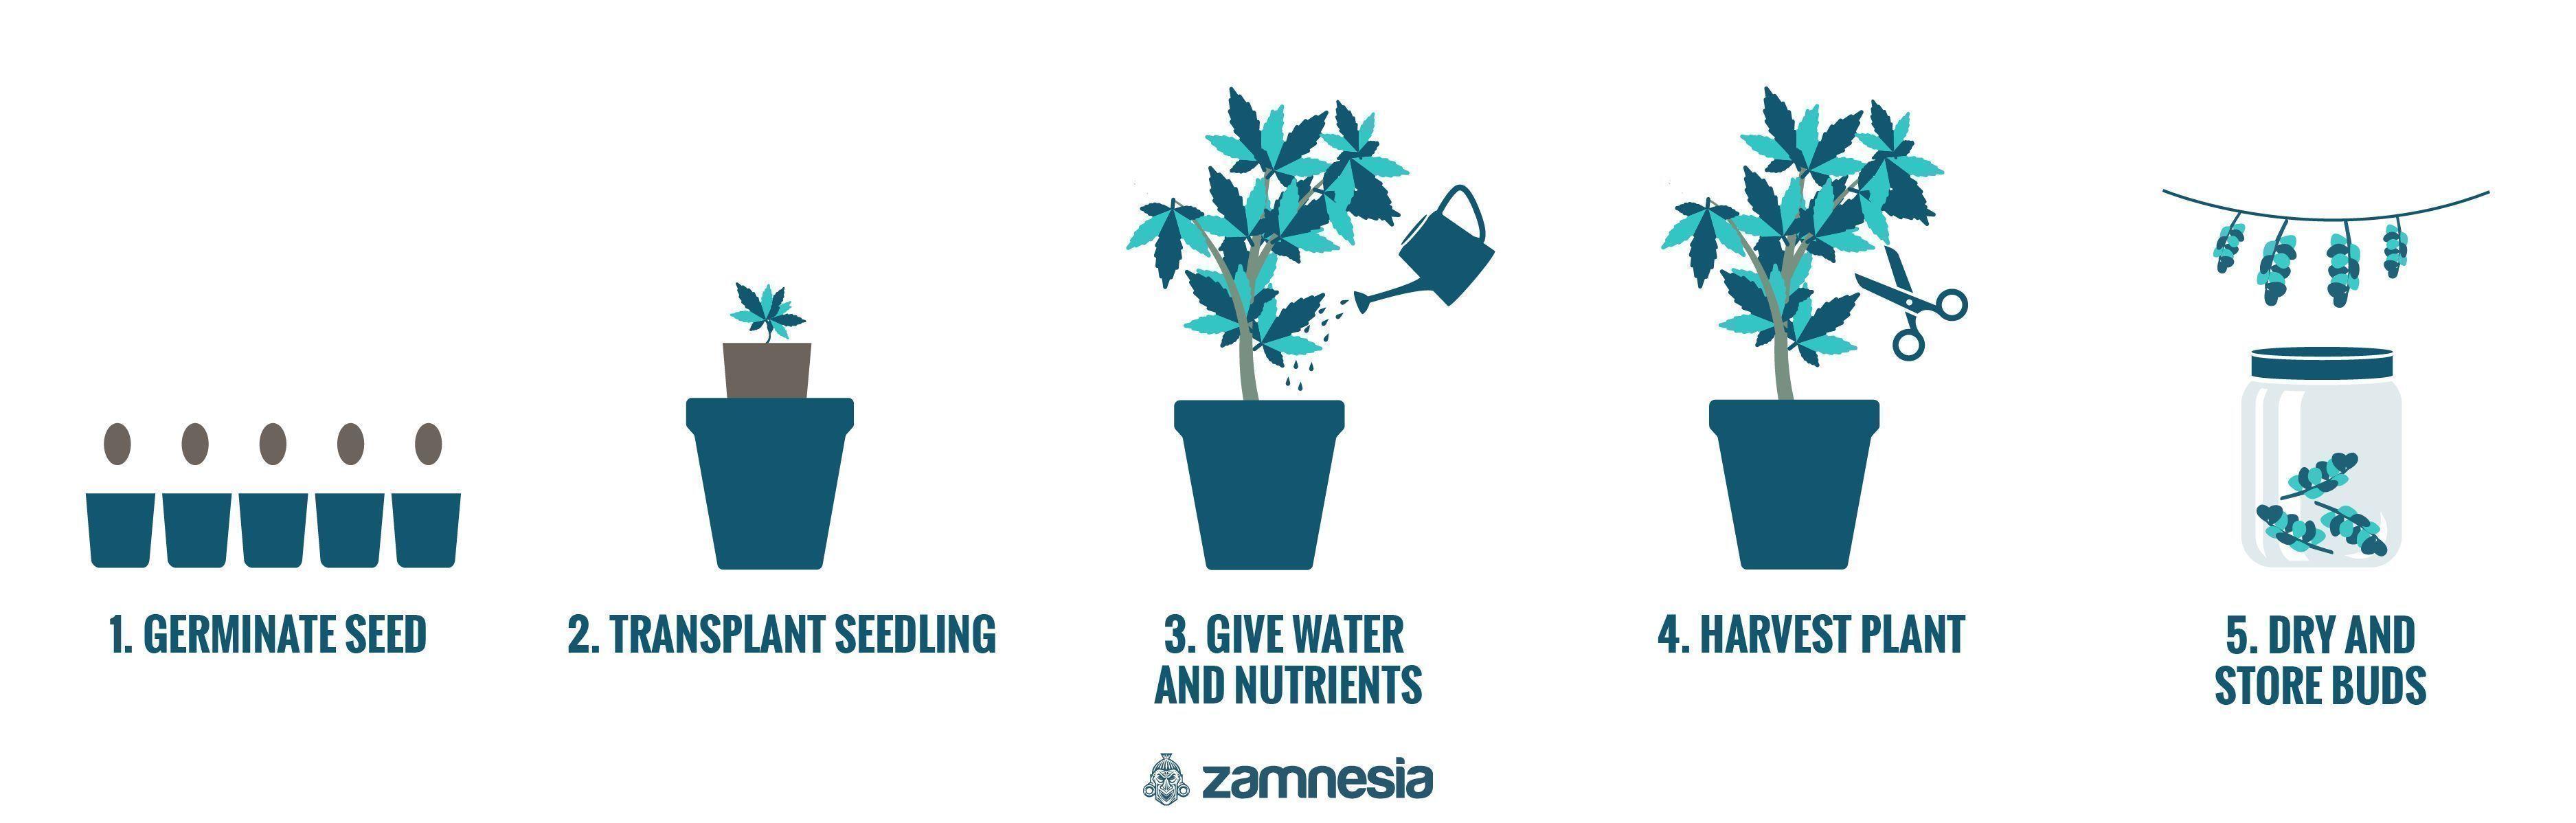 Growing Cannabis In 5 Easy Steps